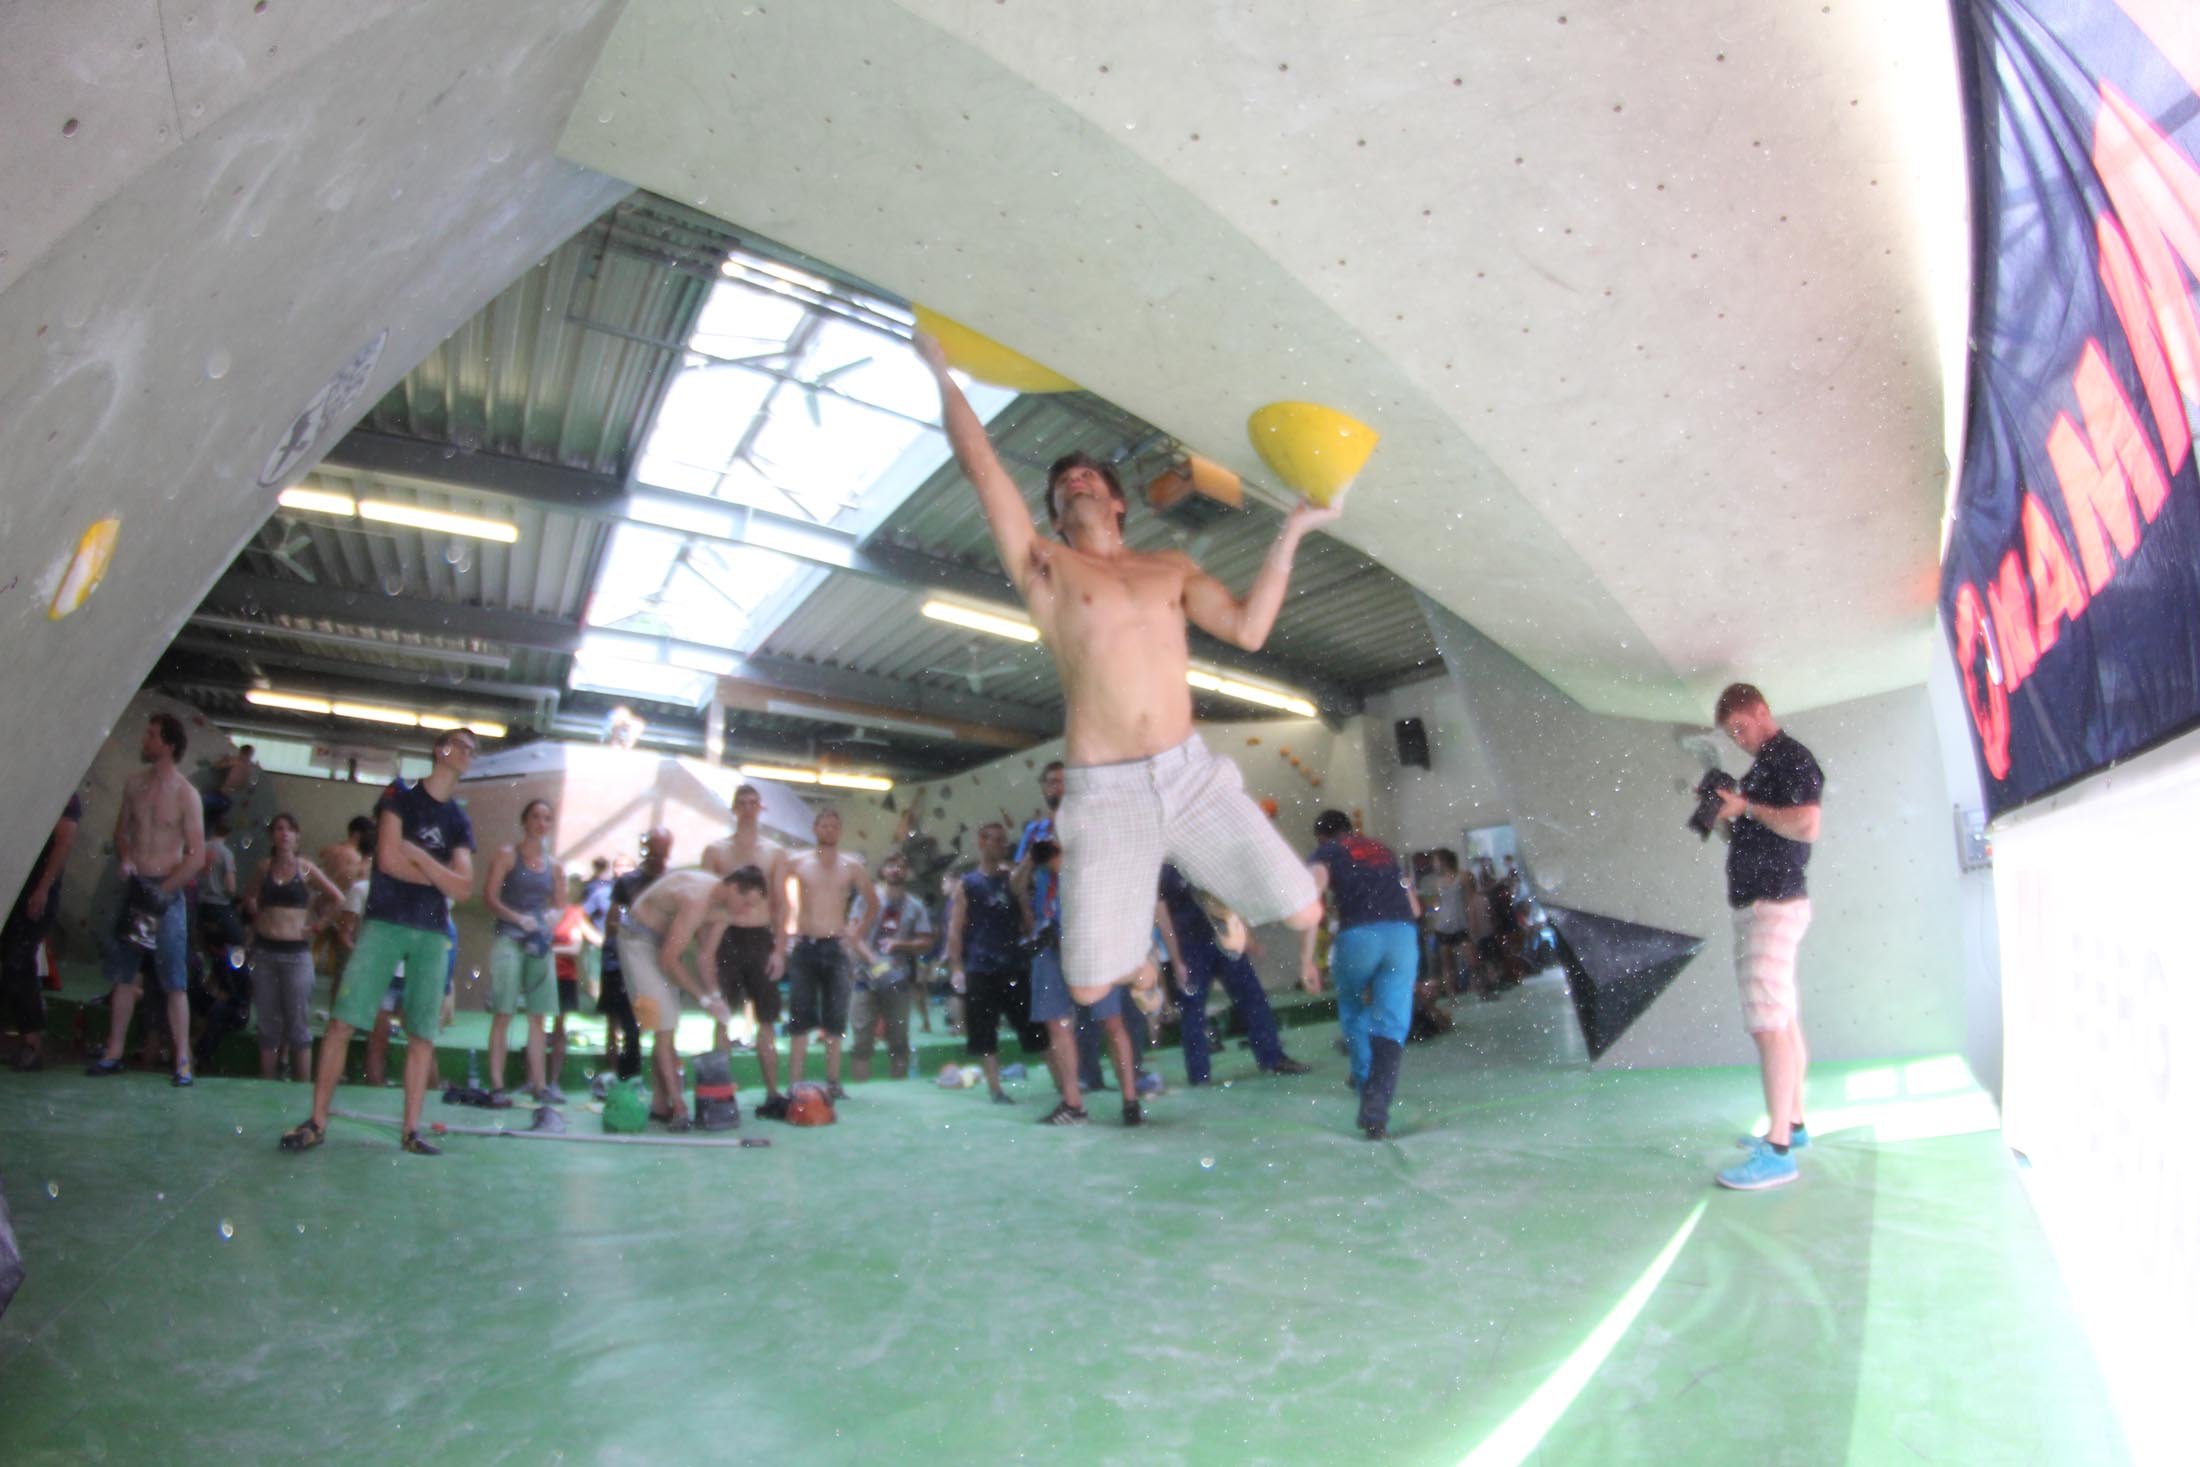 Quali, internationaler bouldercup Frankenjura 2016, BLOCKHELDEN Erlangen, Mammut, Bergfreunde.de, Boulderwettkampf07092016171